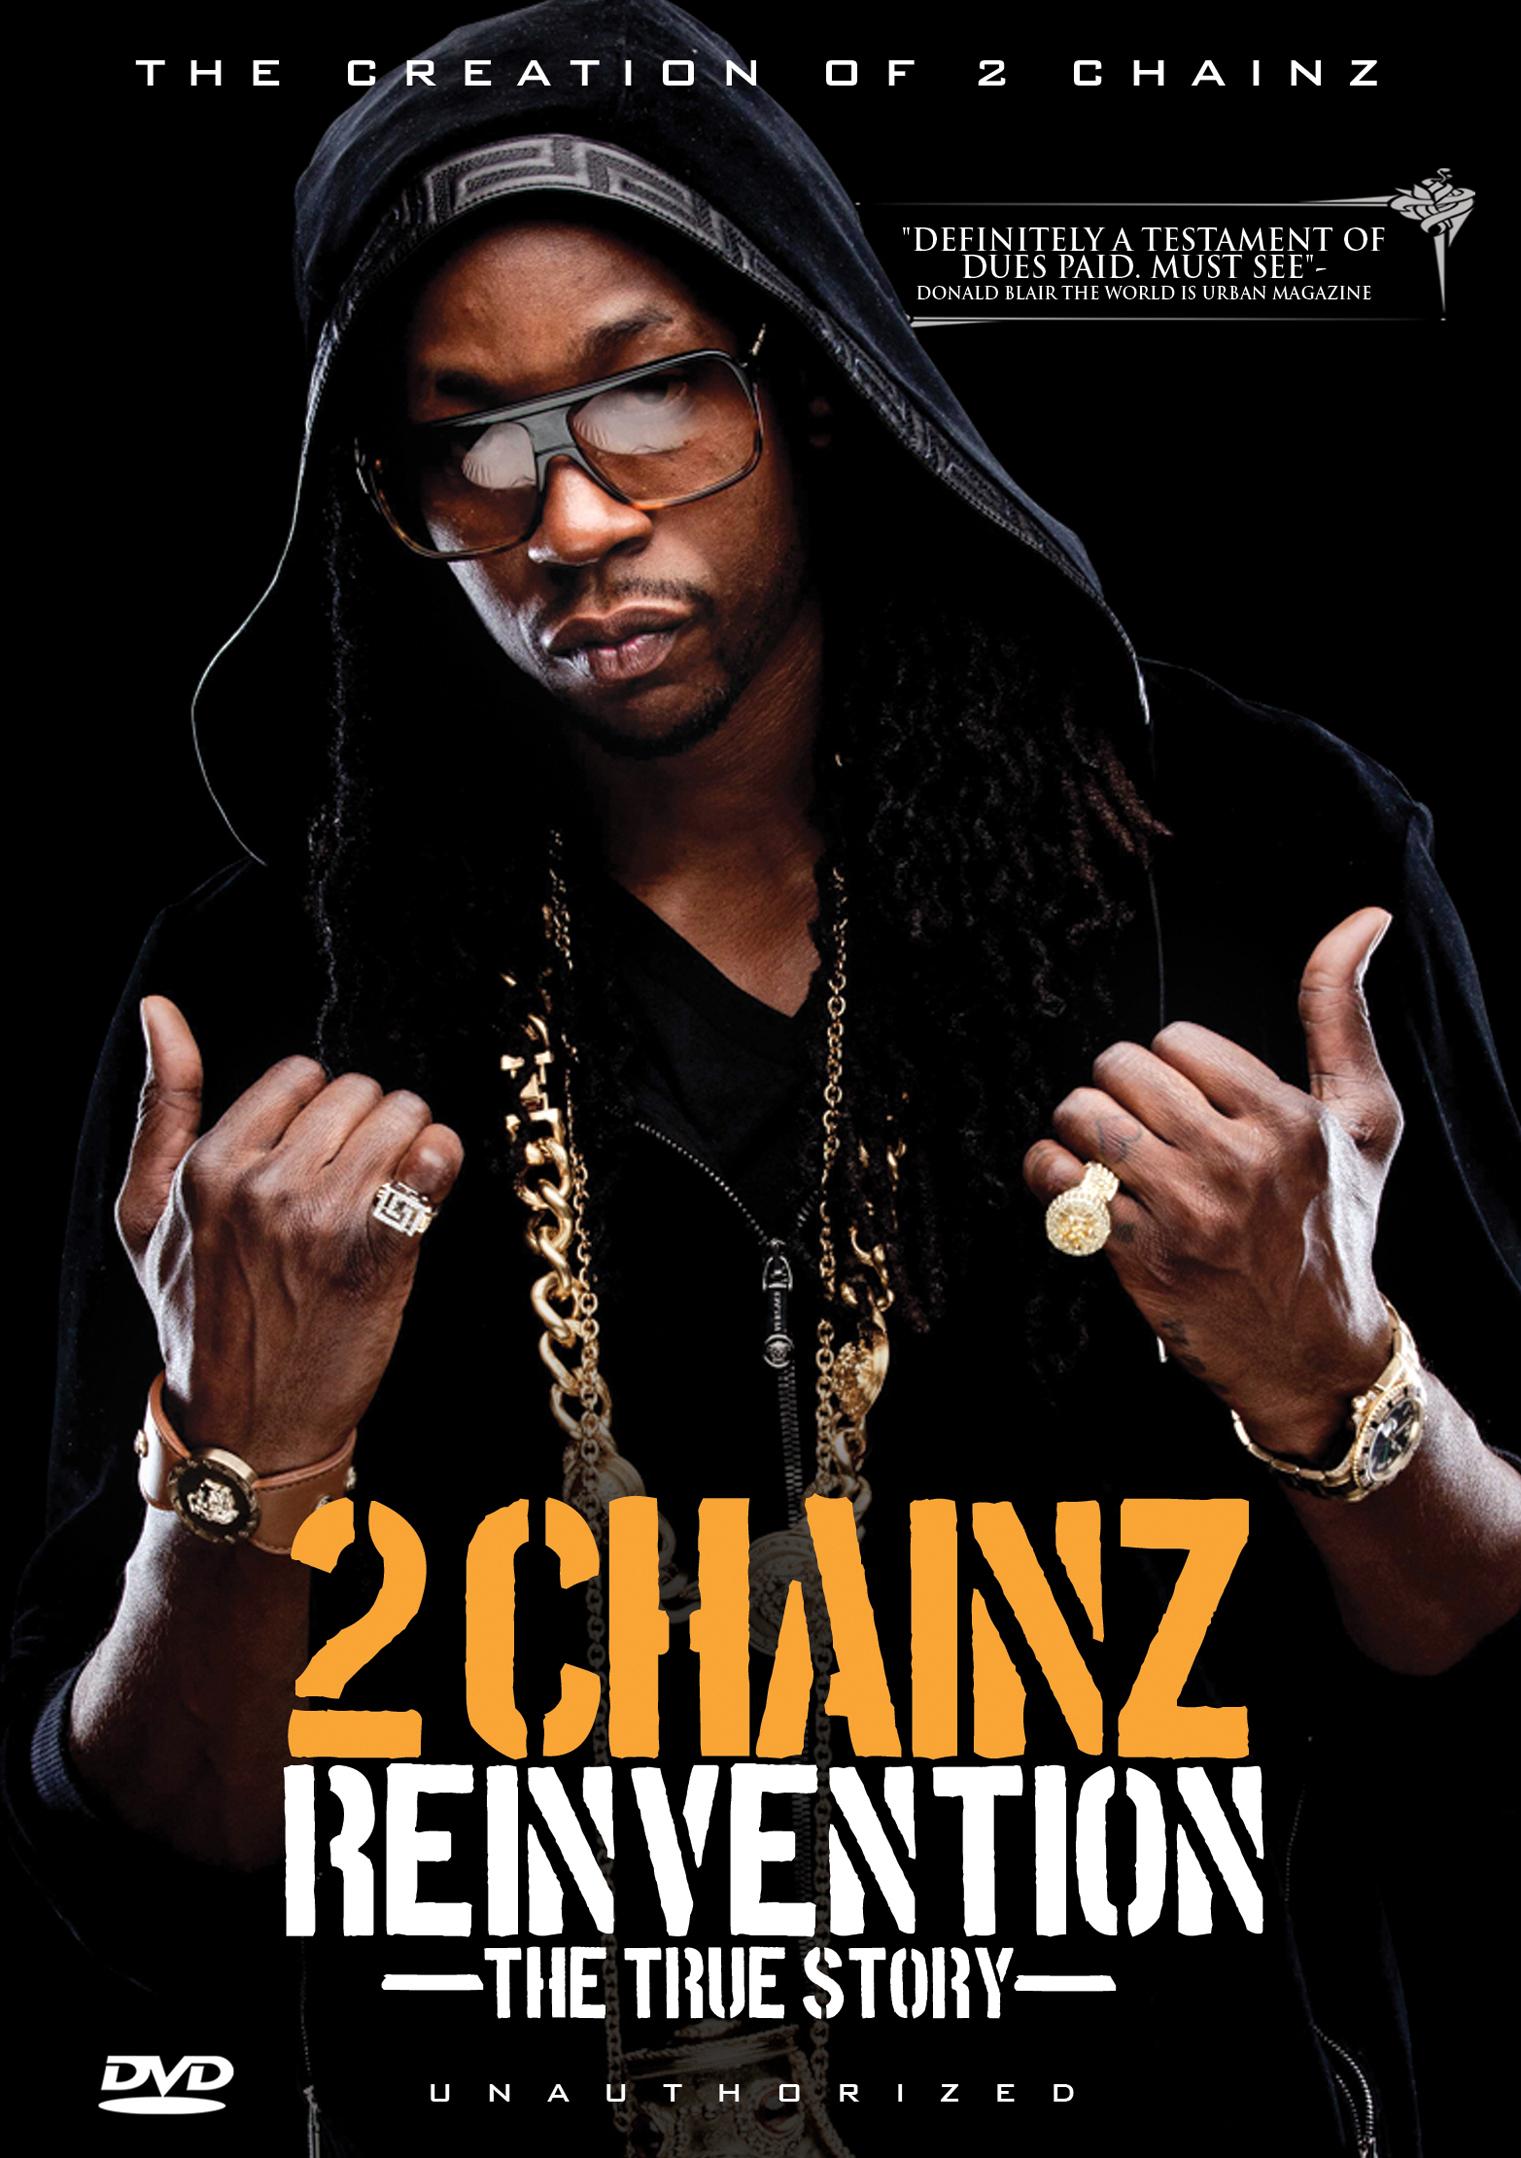 2 Chainz: Reinvention - The True Story